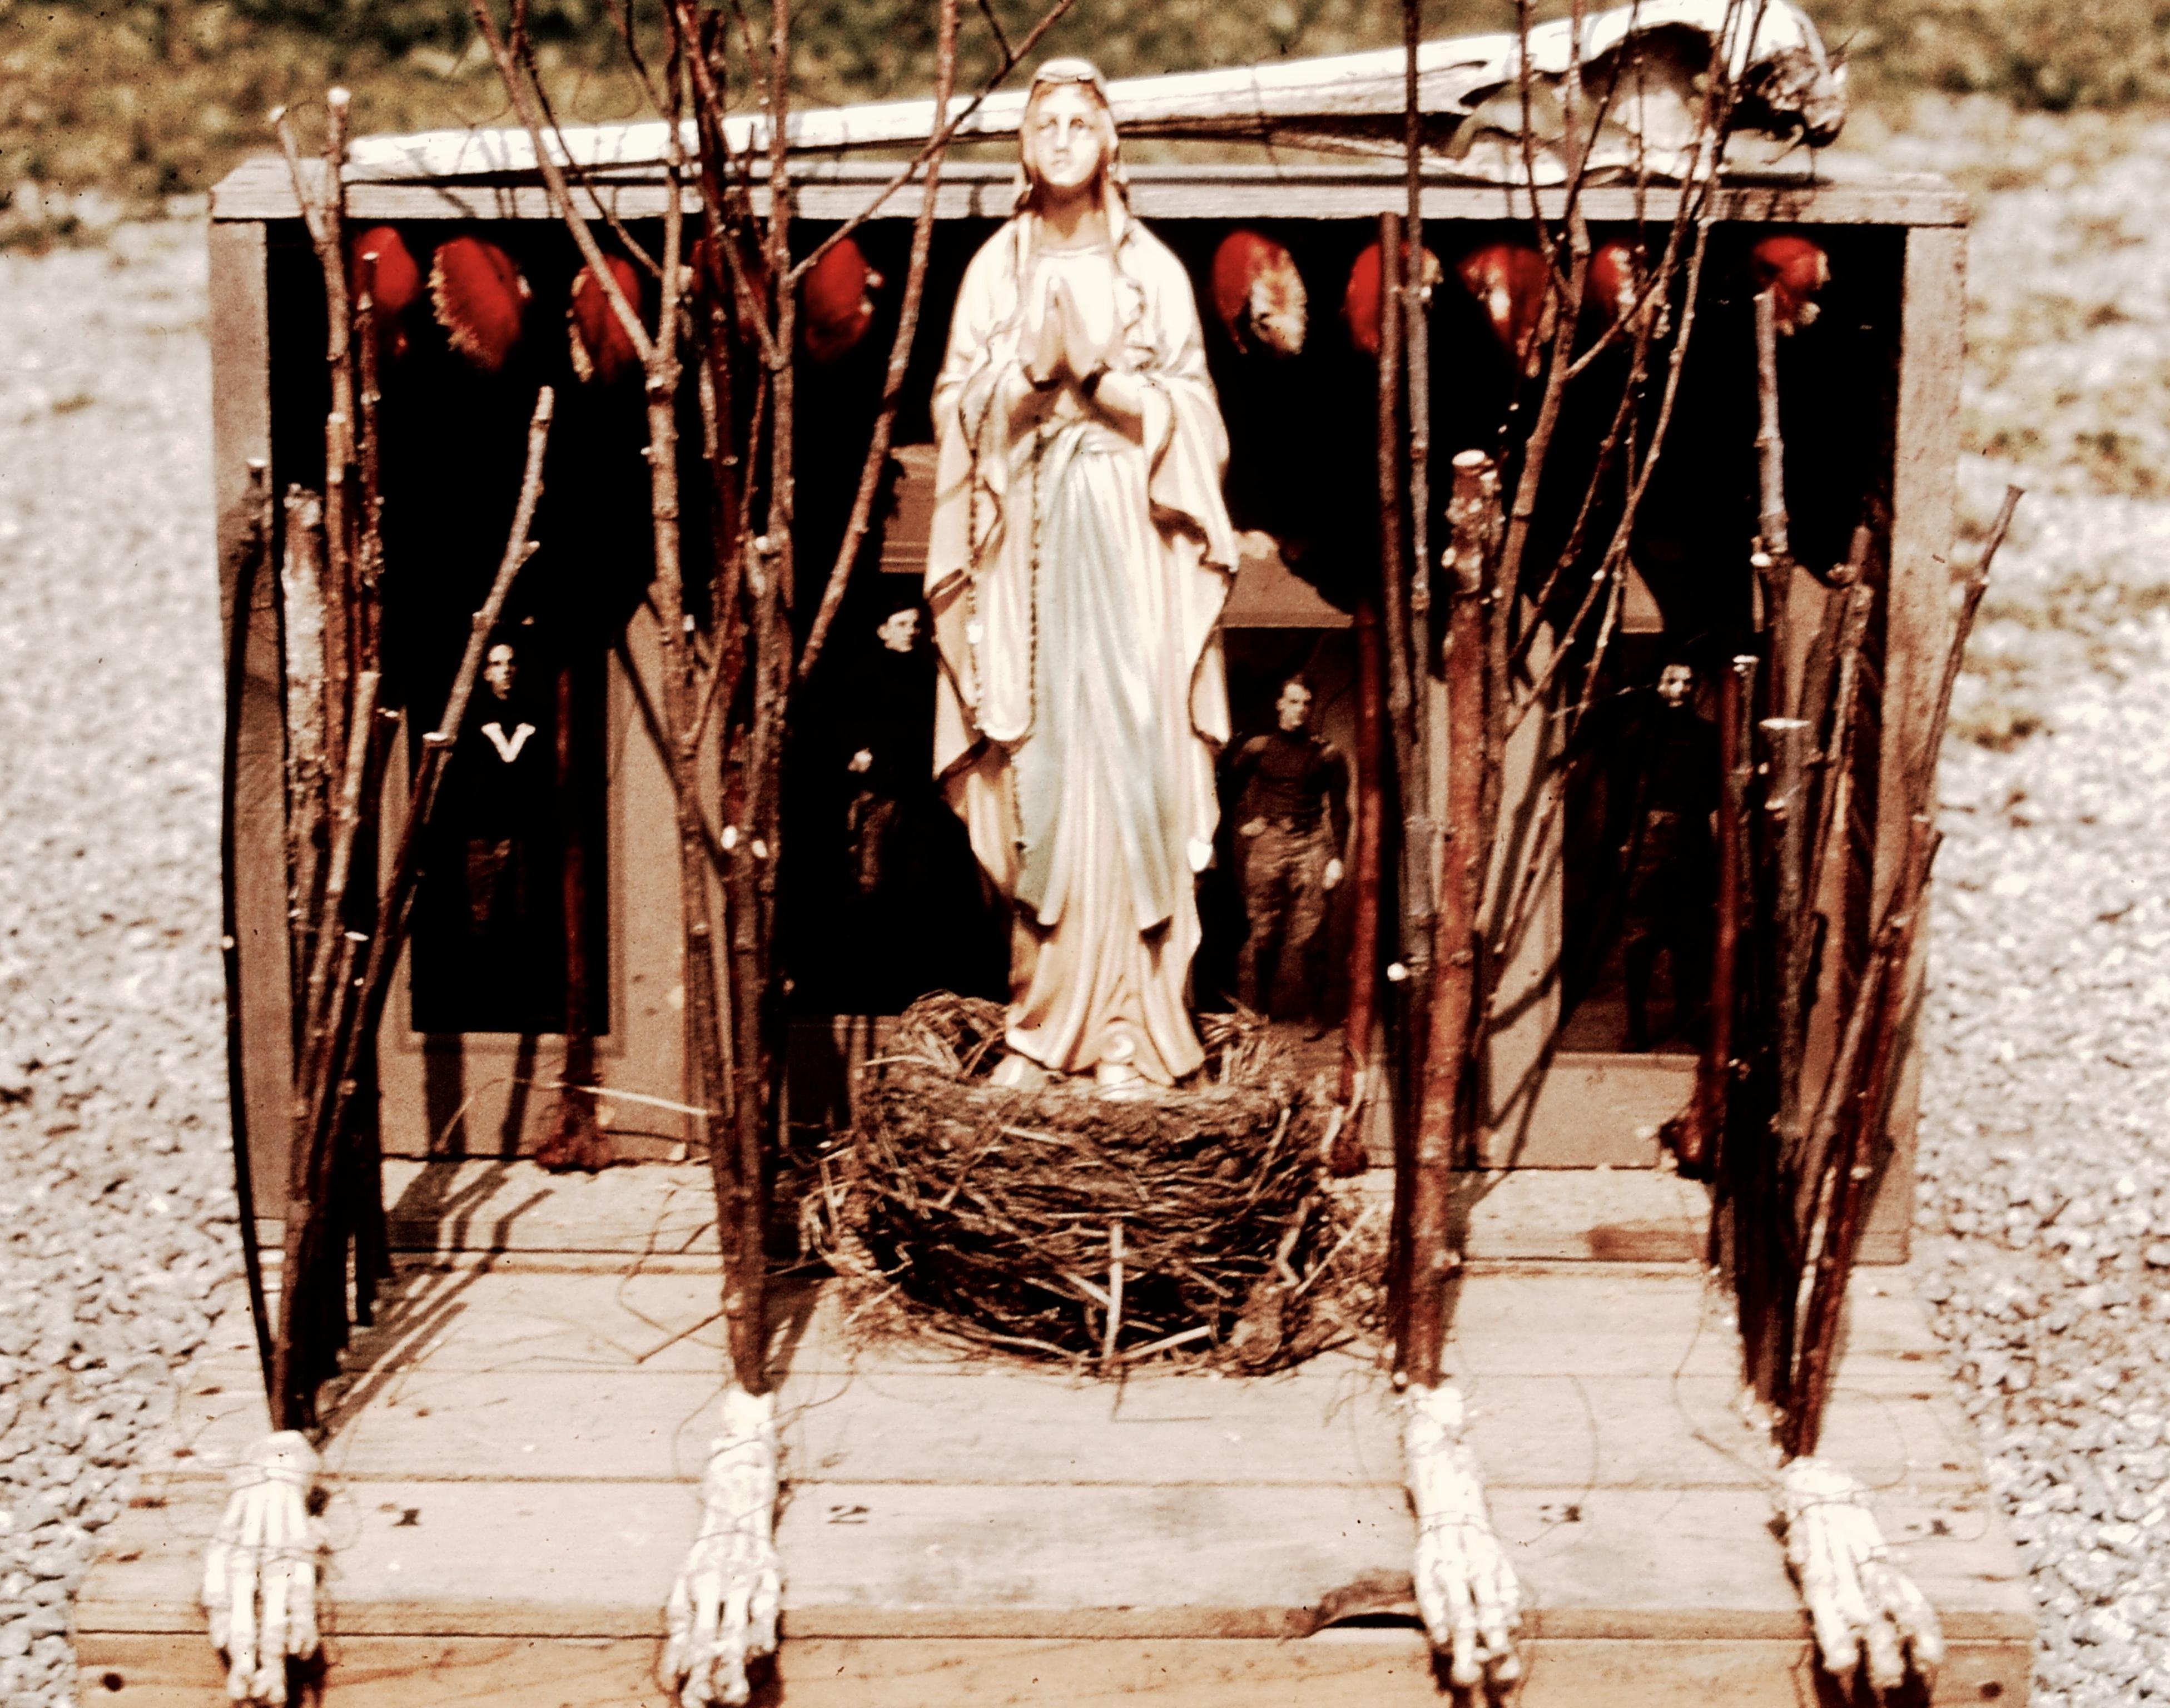 The Virgin's Chest